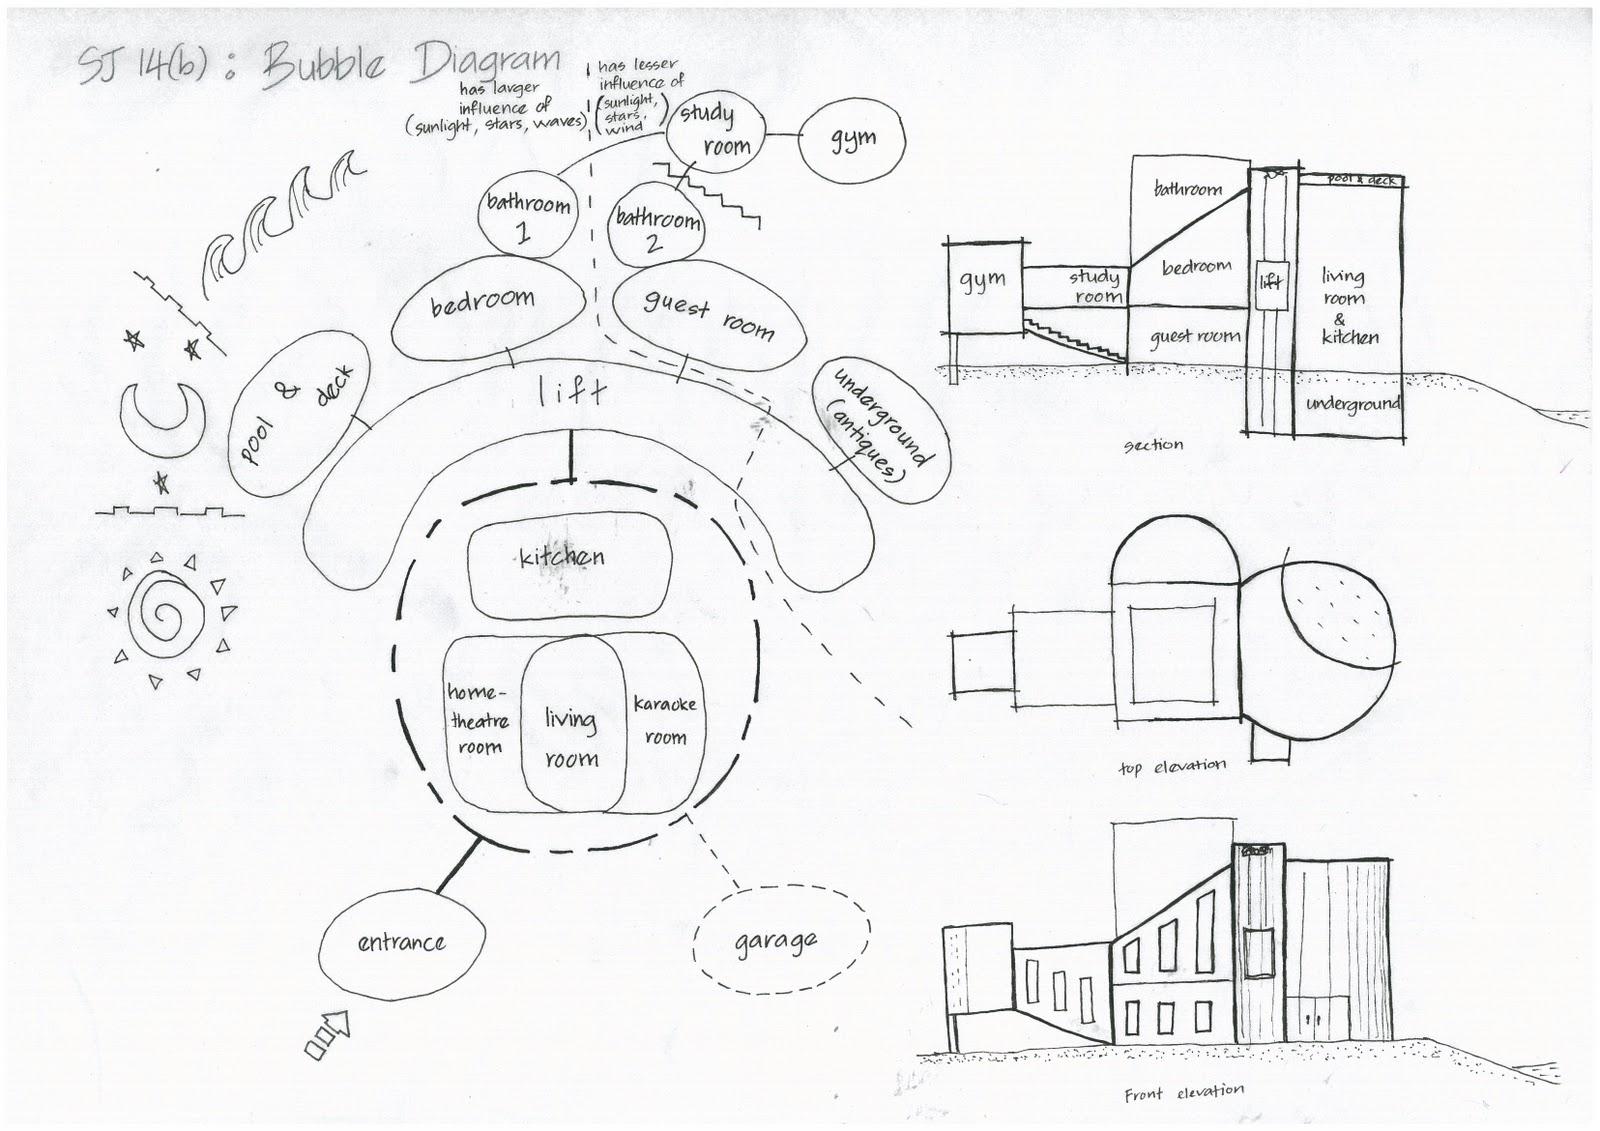 Architecture Sj 14 B